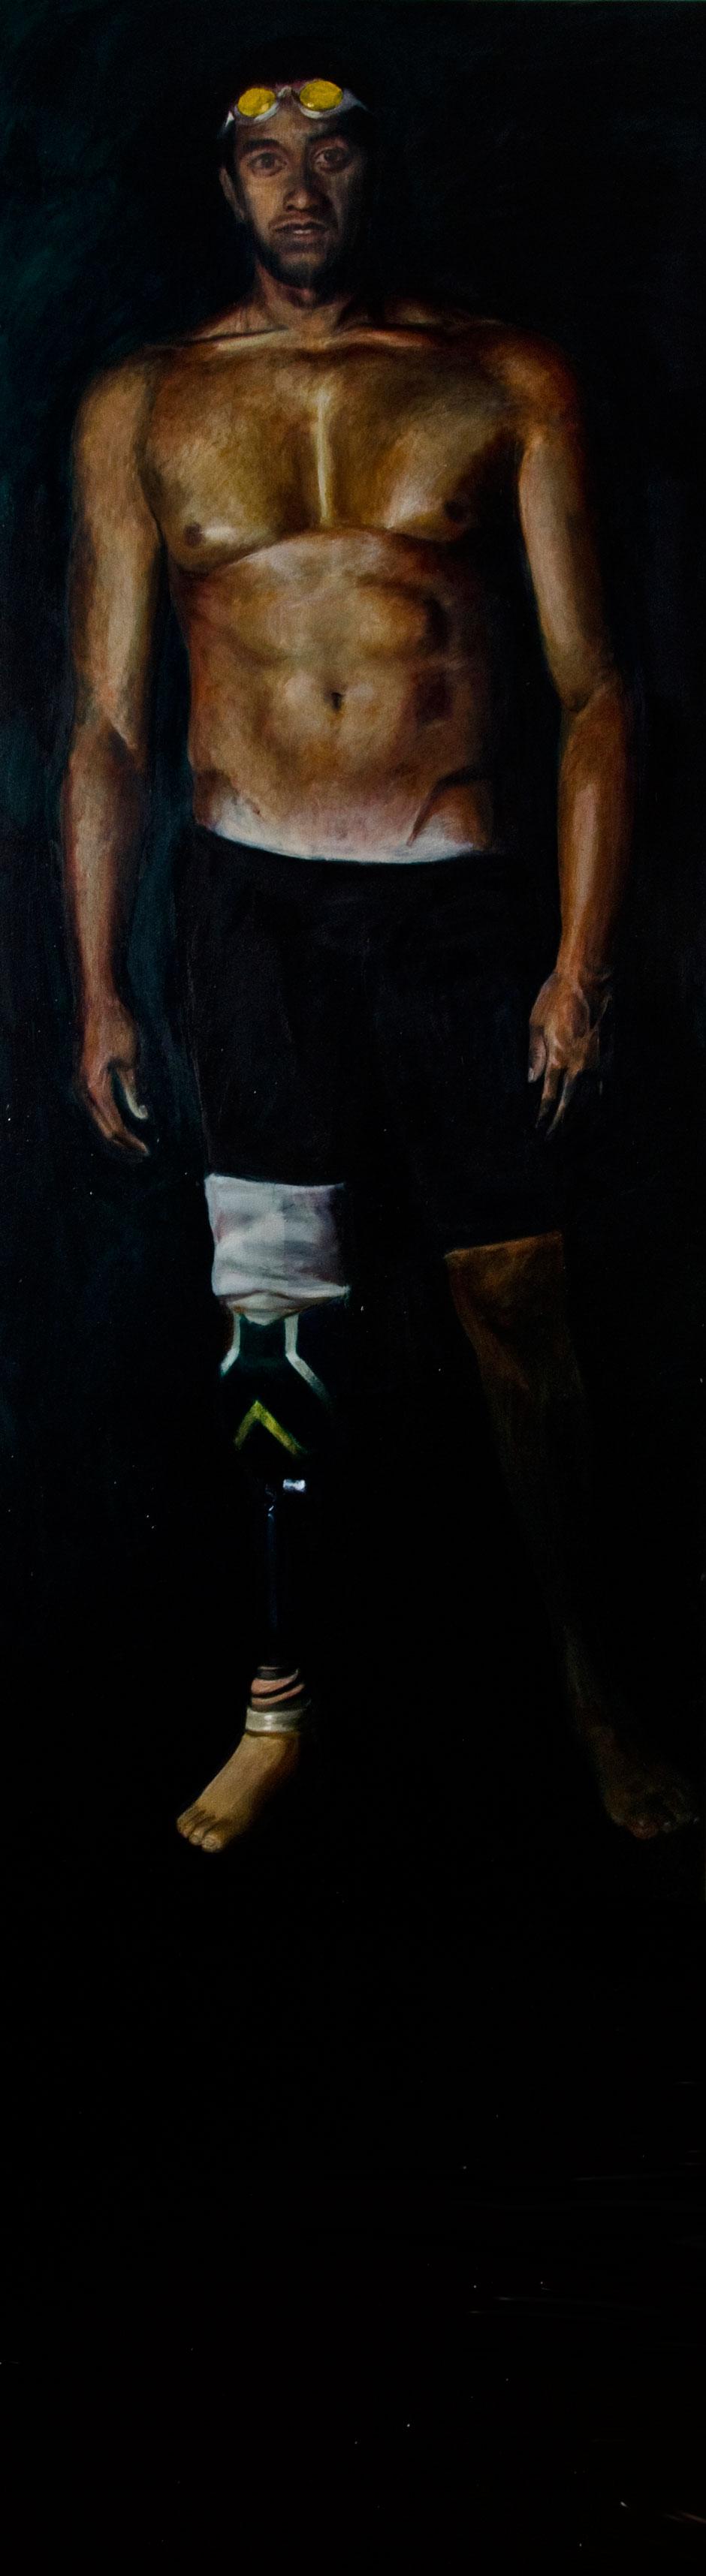 """Aigias of Pharsalos"". Oil on Canvas. 2011"